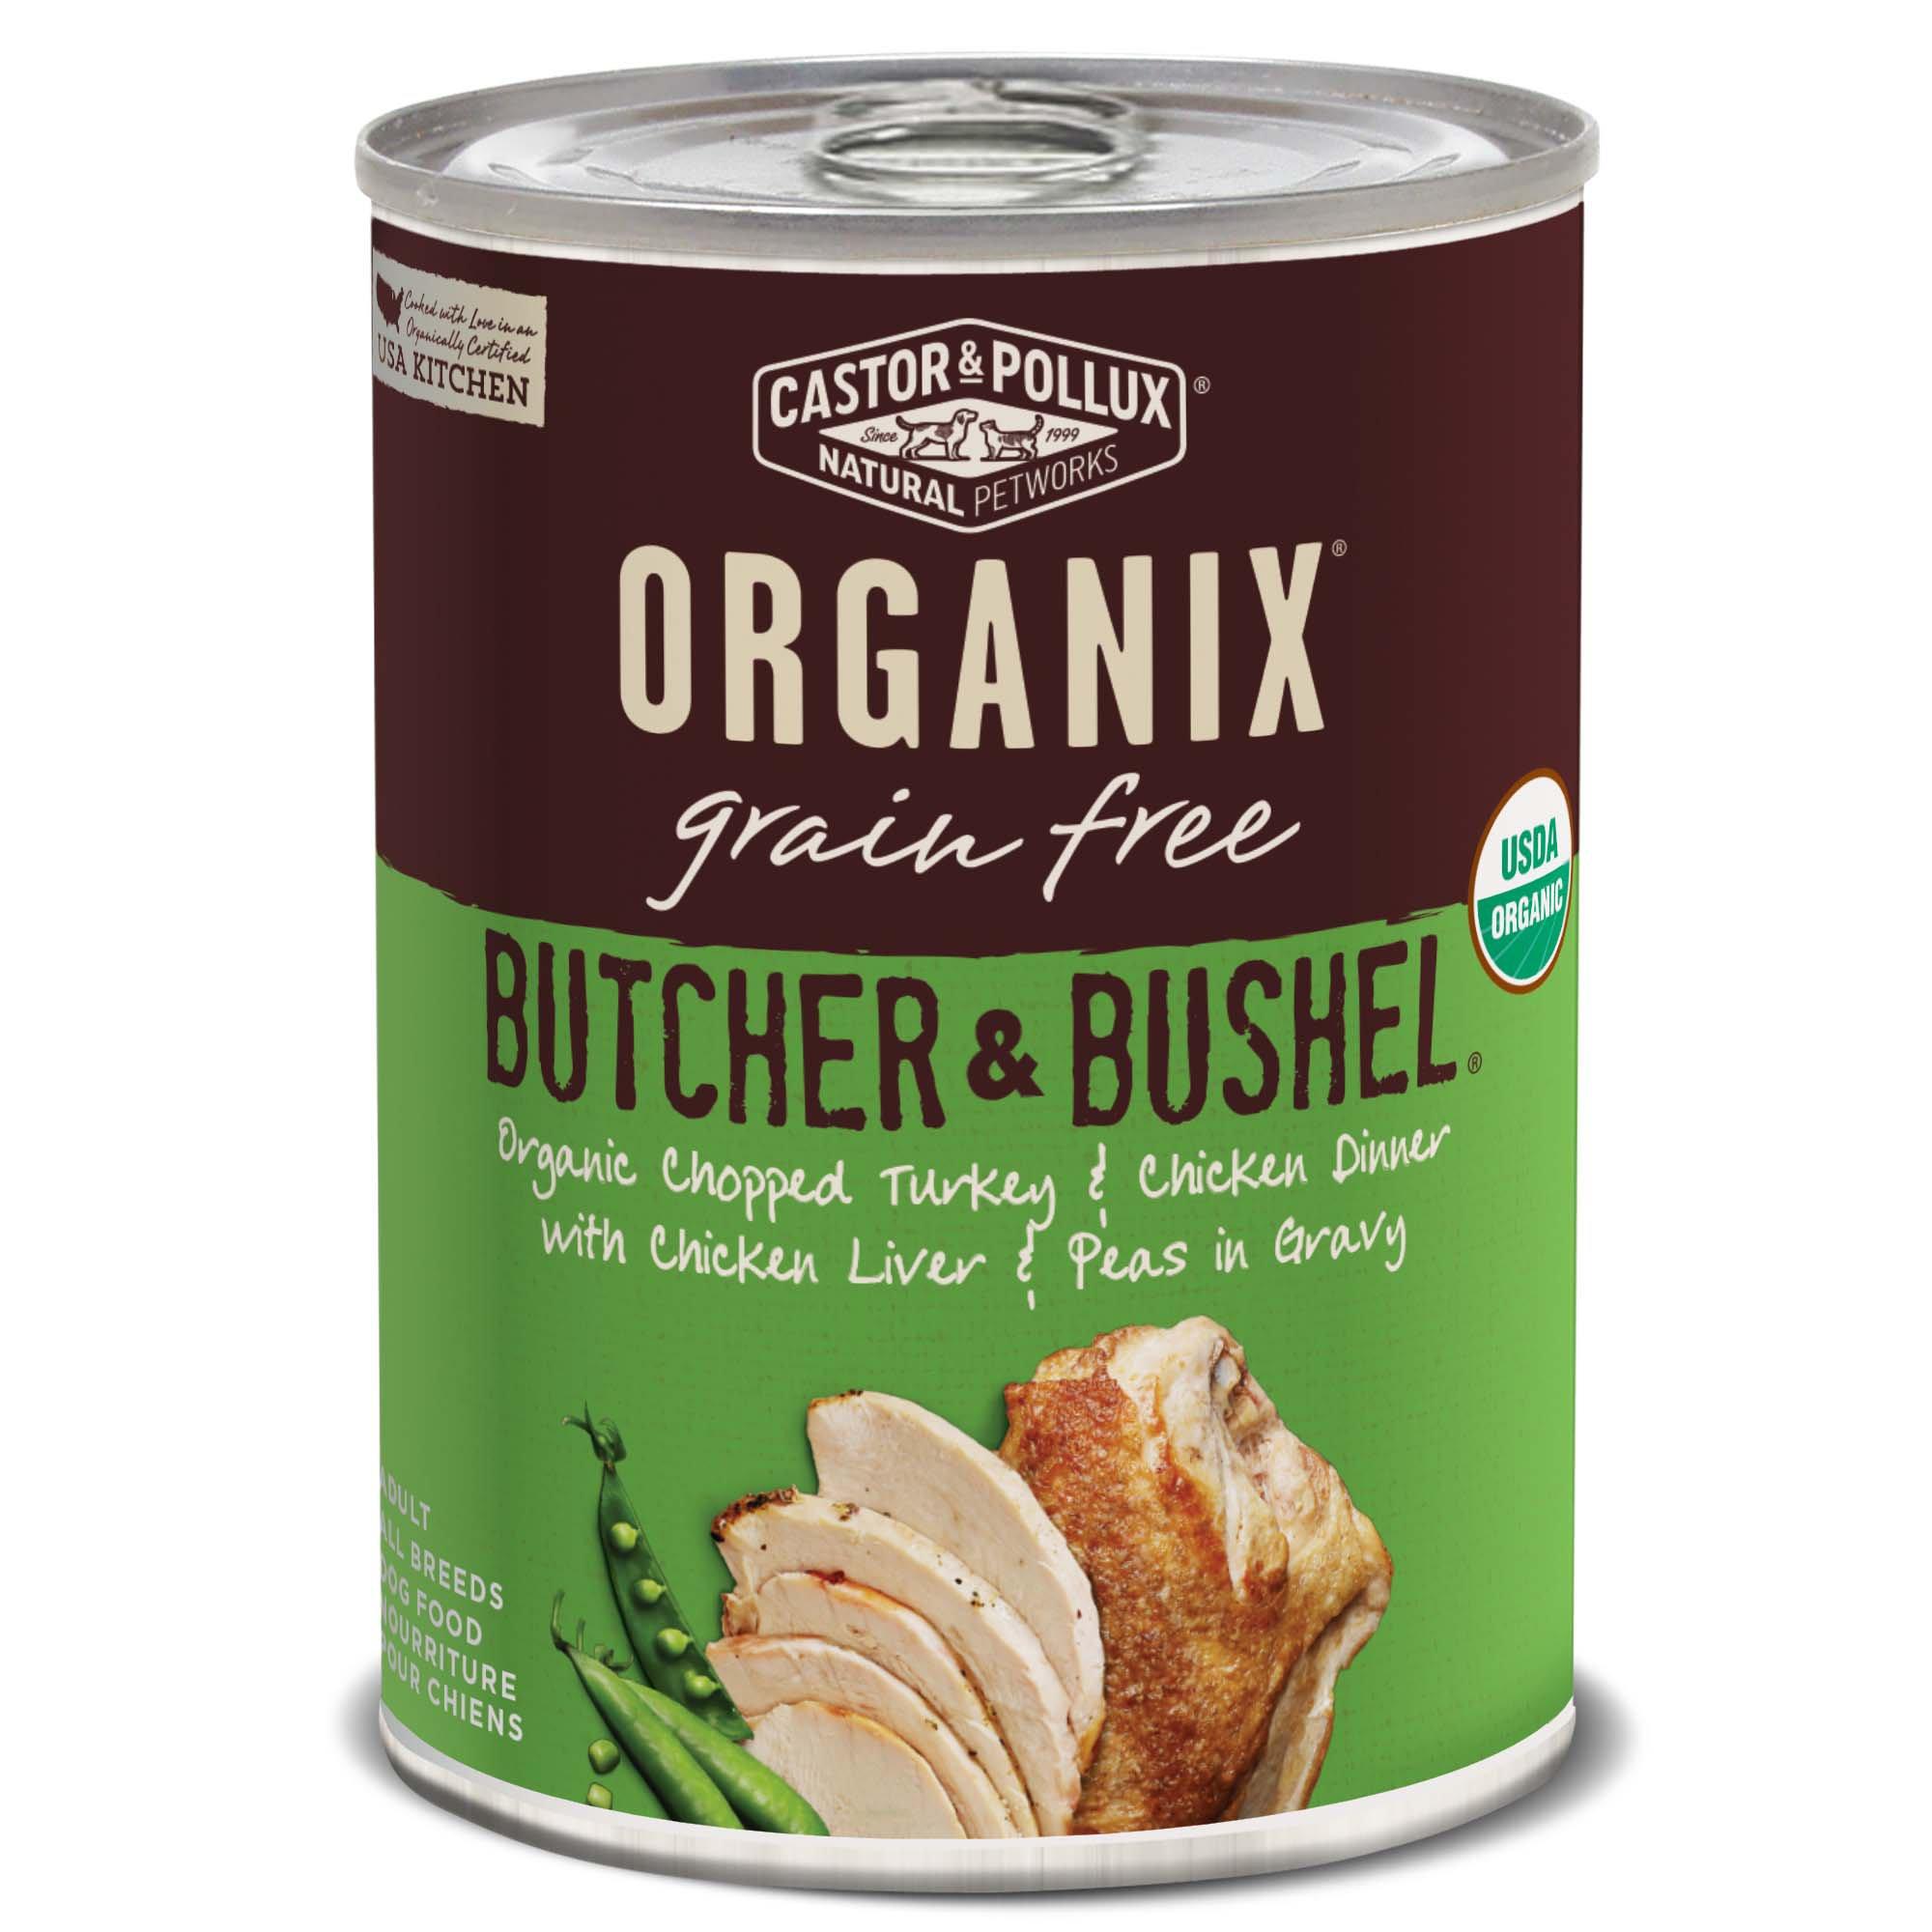 Image of Castor & Pollux Organix Butcher & Bushel Grain Free Organic Chopped Turkey & Chicken Dinner Wet Dog Food, 12.7 oz., Case of 12, 12 X 12.7 OZ